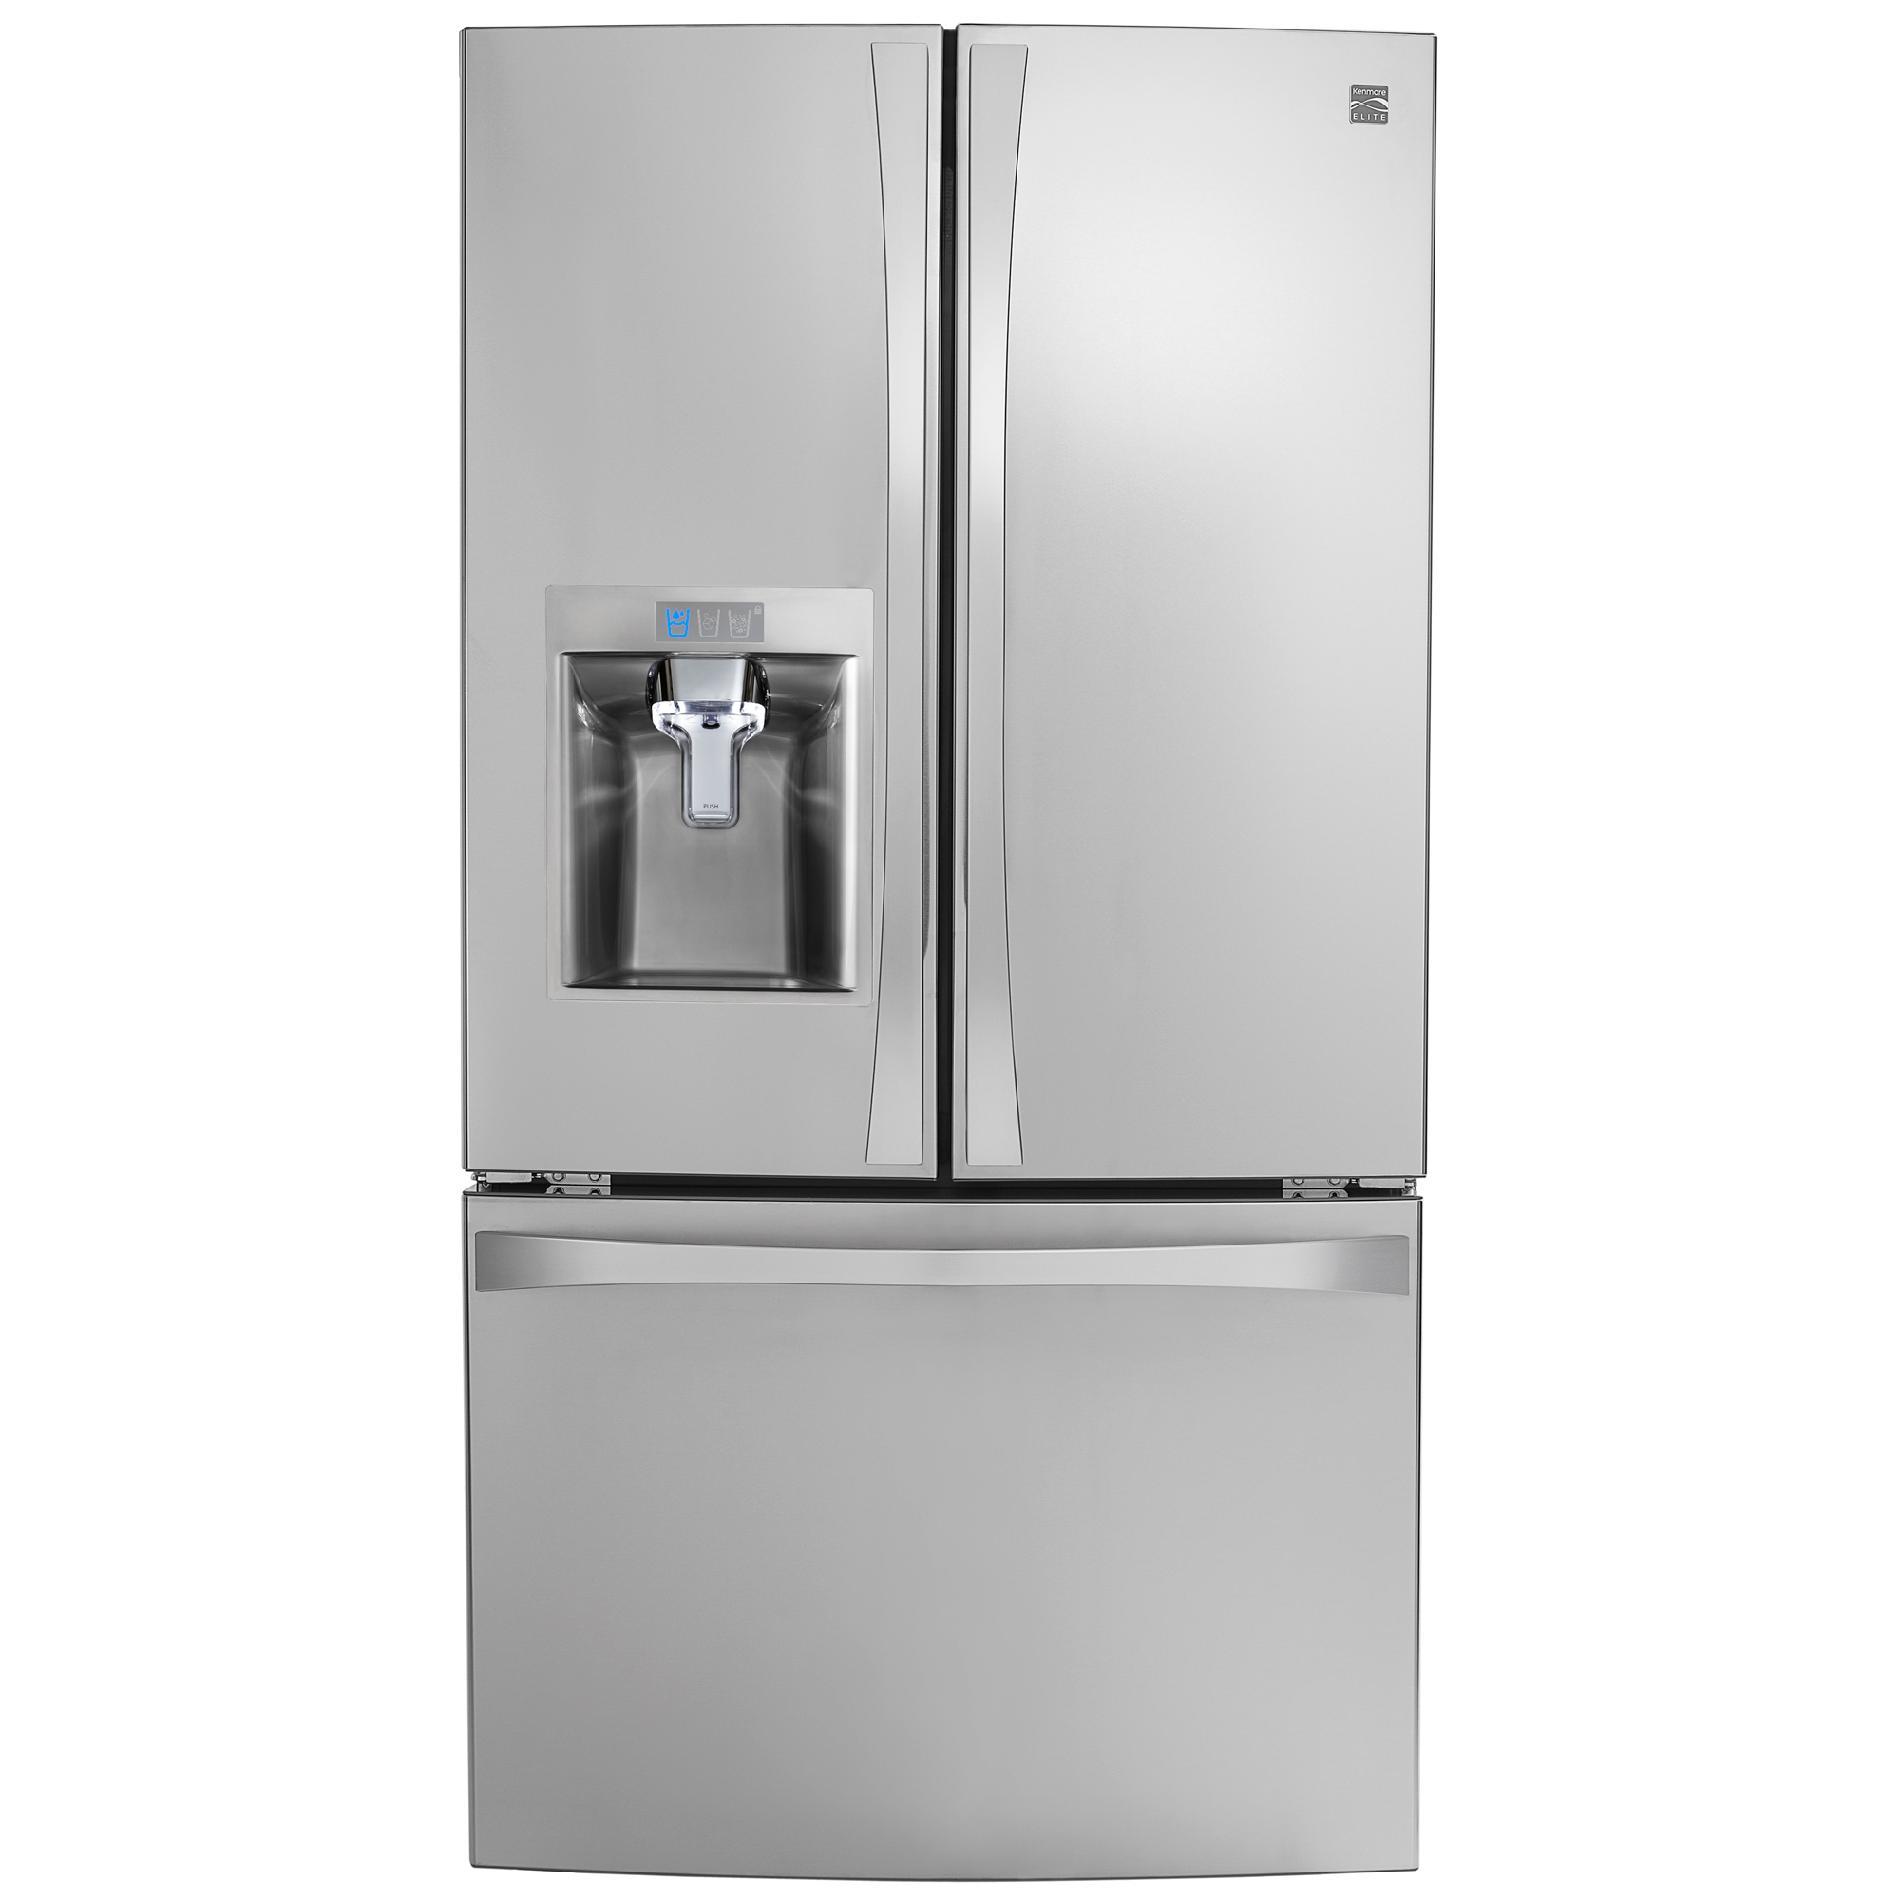 medium resolution of kenmore elite refrigerator compressor wiring diagrams kenmore freezer schematic kenmore refrigerator wiring diagram